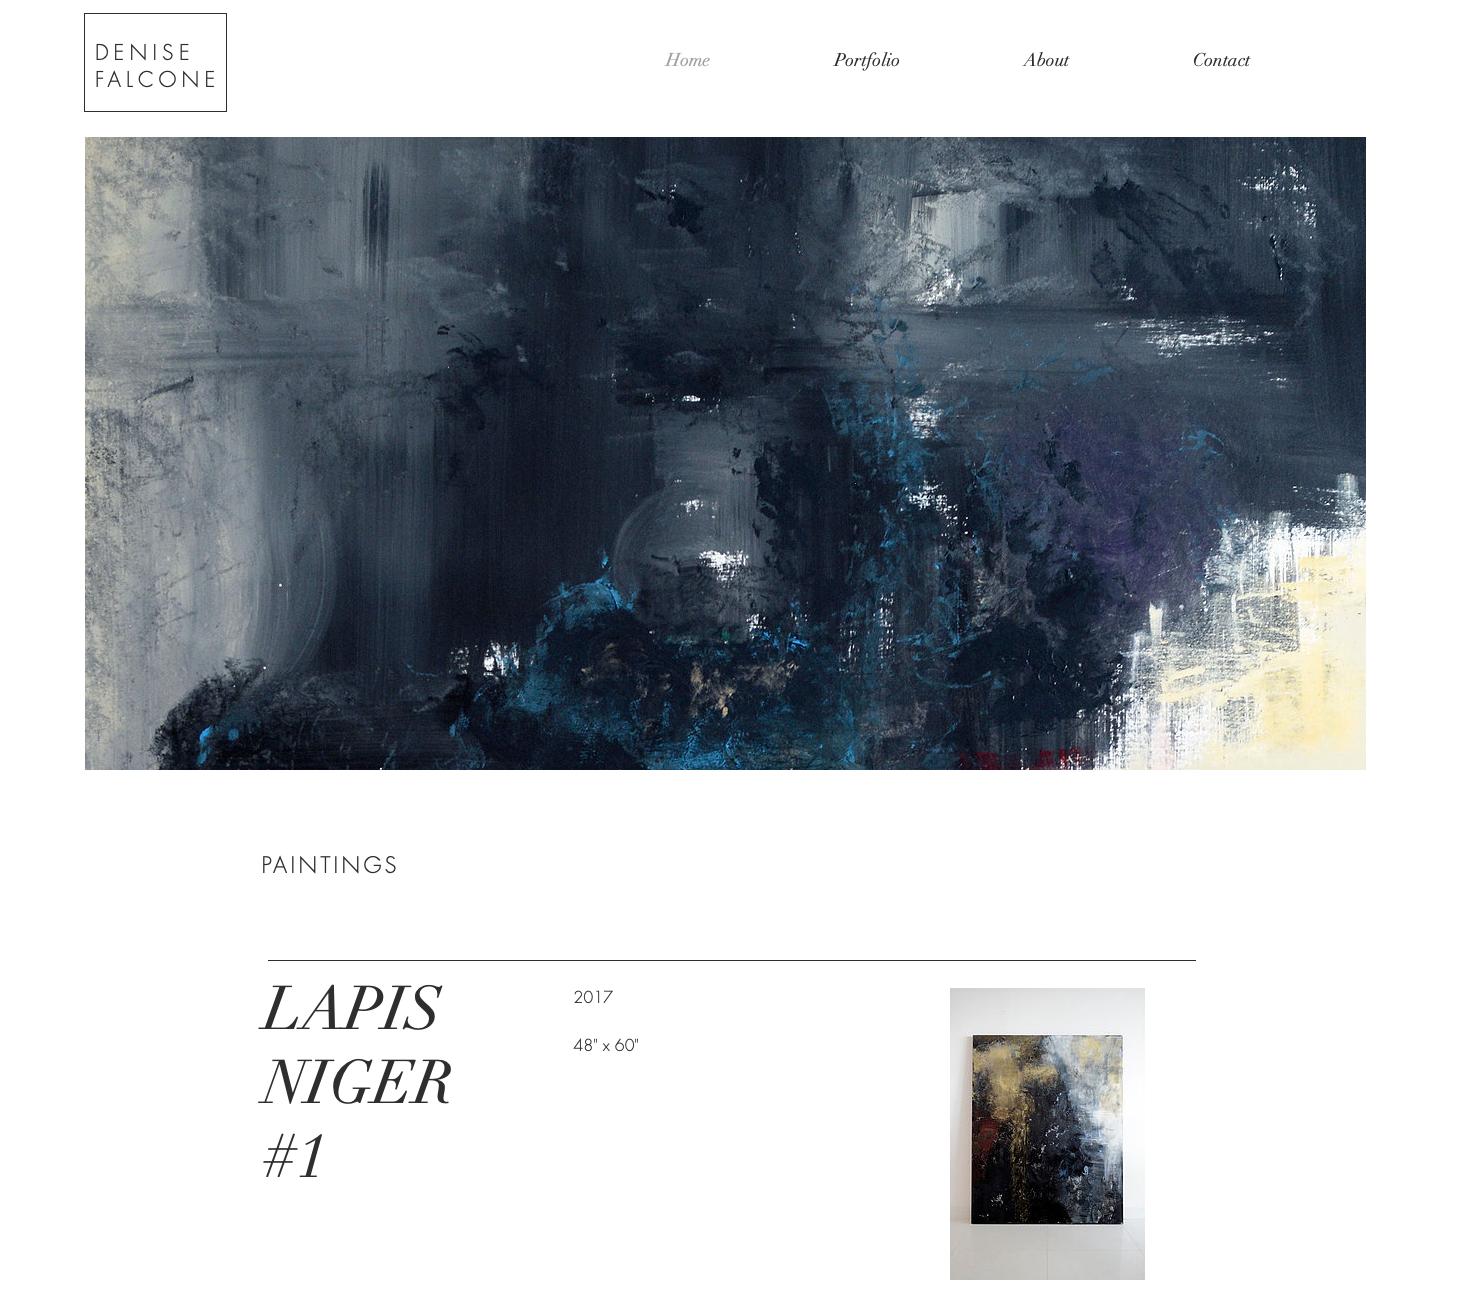 [[WEBSITE DESIGN FOR ARTIST + ARTWORK PHOTOGRAPHY///DESIGN WEBSITE DE ARTISTA + FOTOGRAFIAS DE ARTE]]